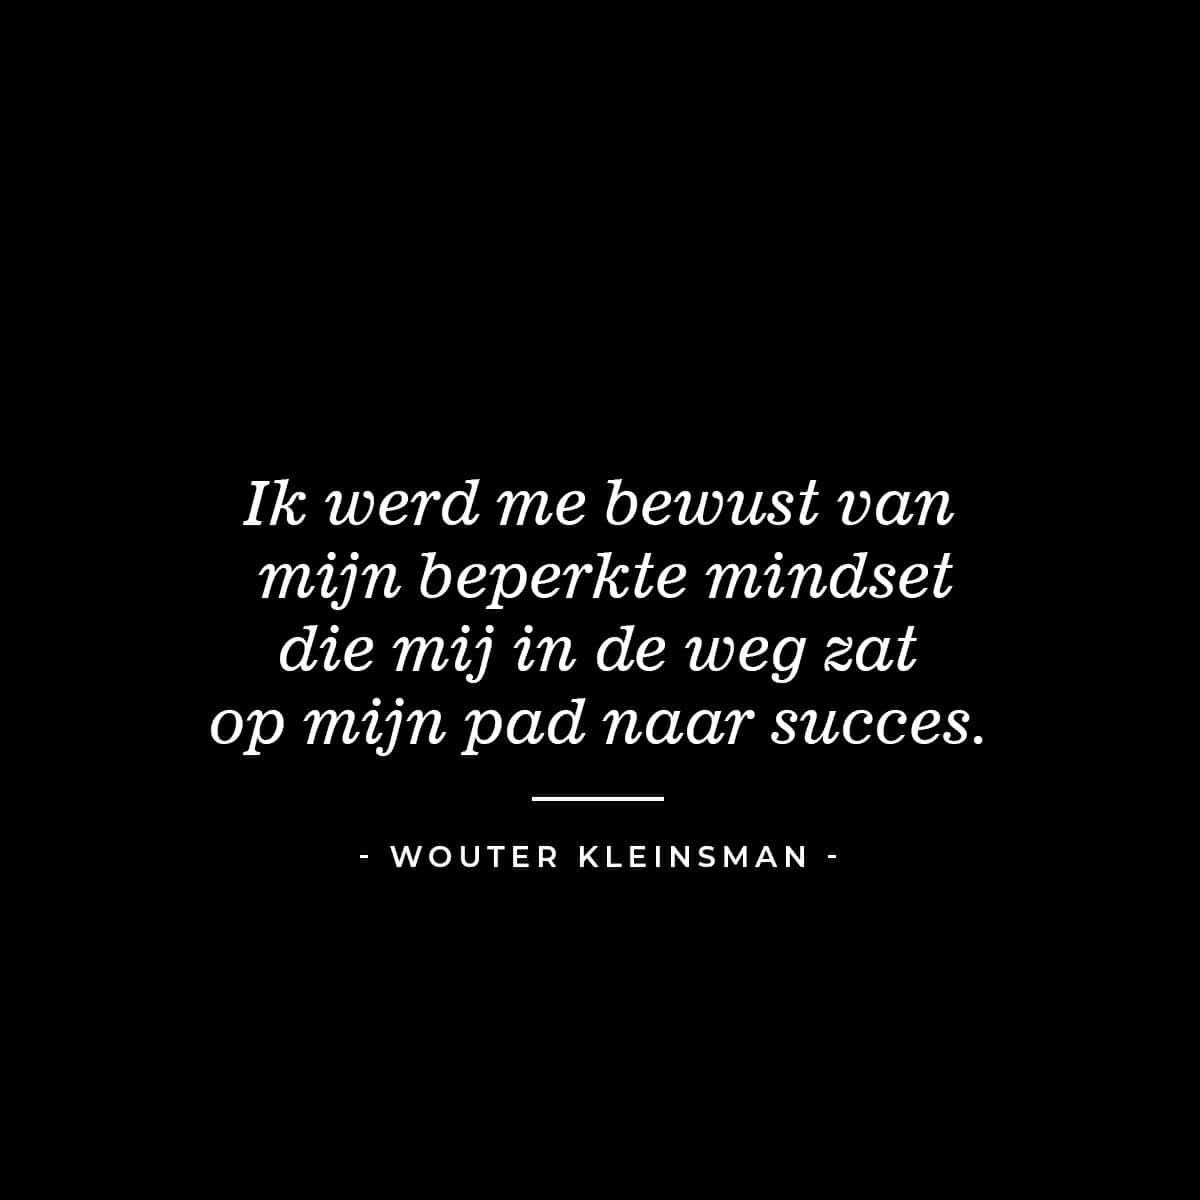 mindset-succes-quote-1